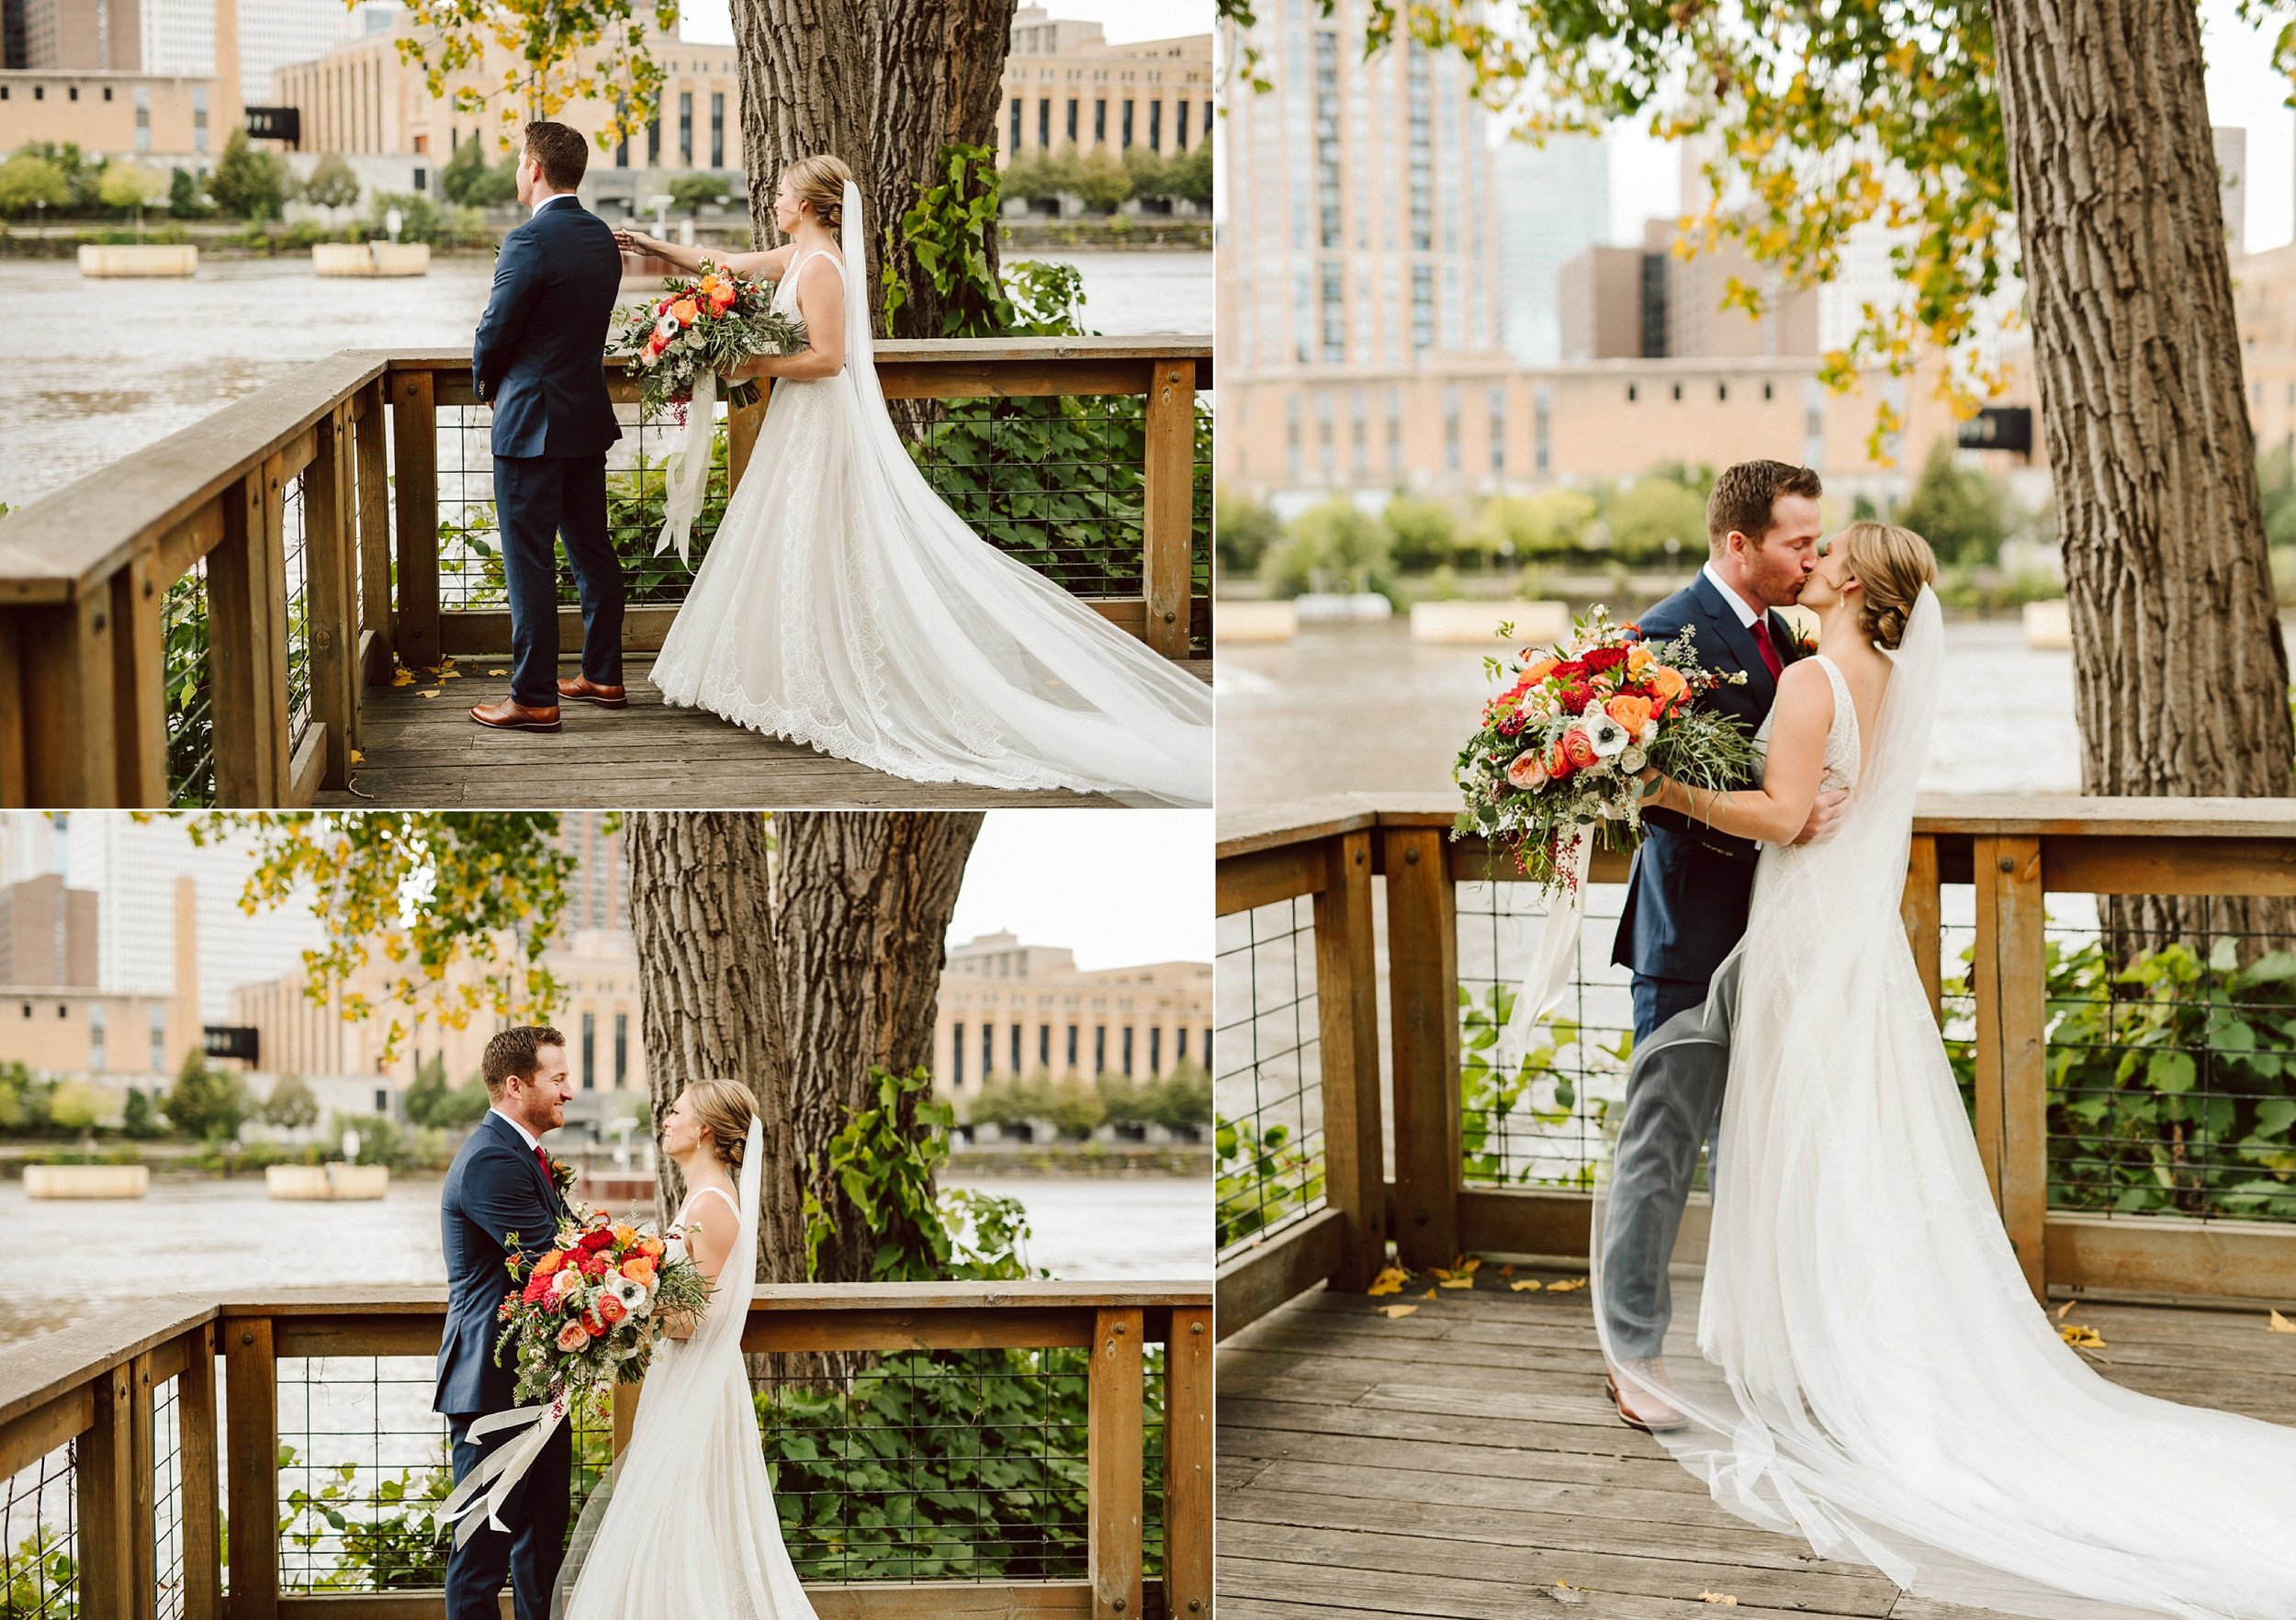 Nicollet-Island-Pavilion-Minneapolis-September-Coral-Navy-Wedding-30.jpg